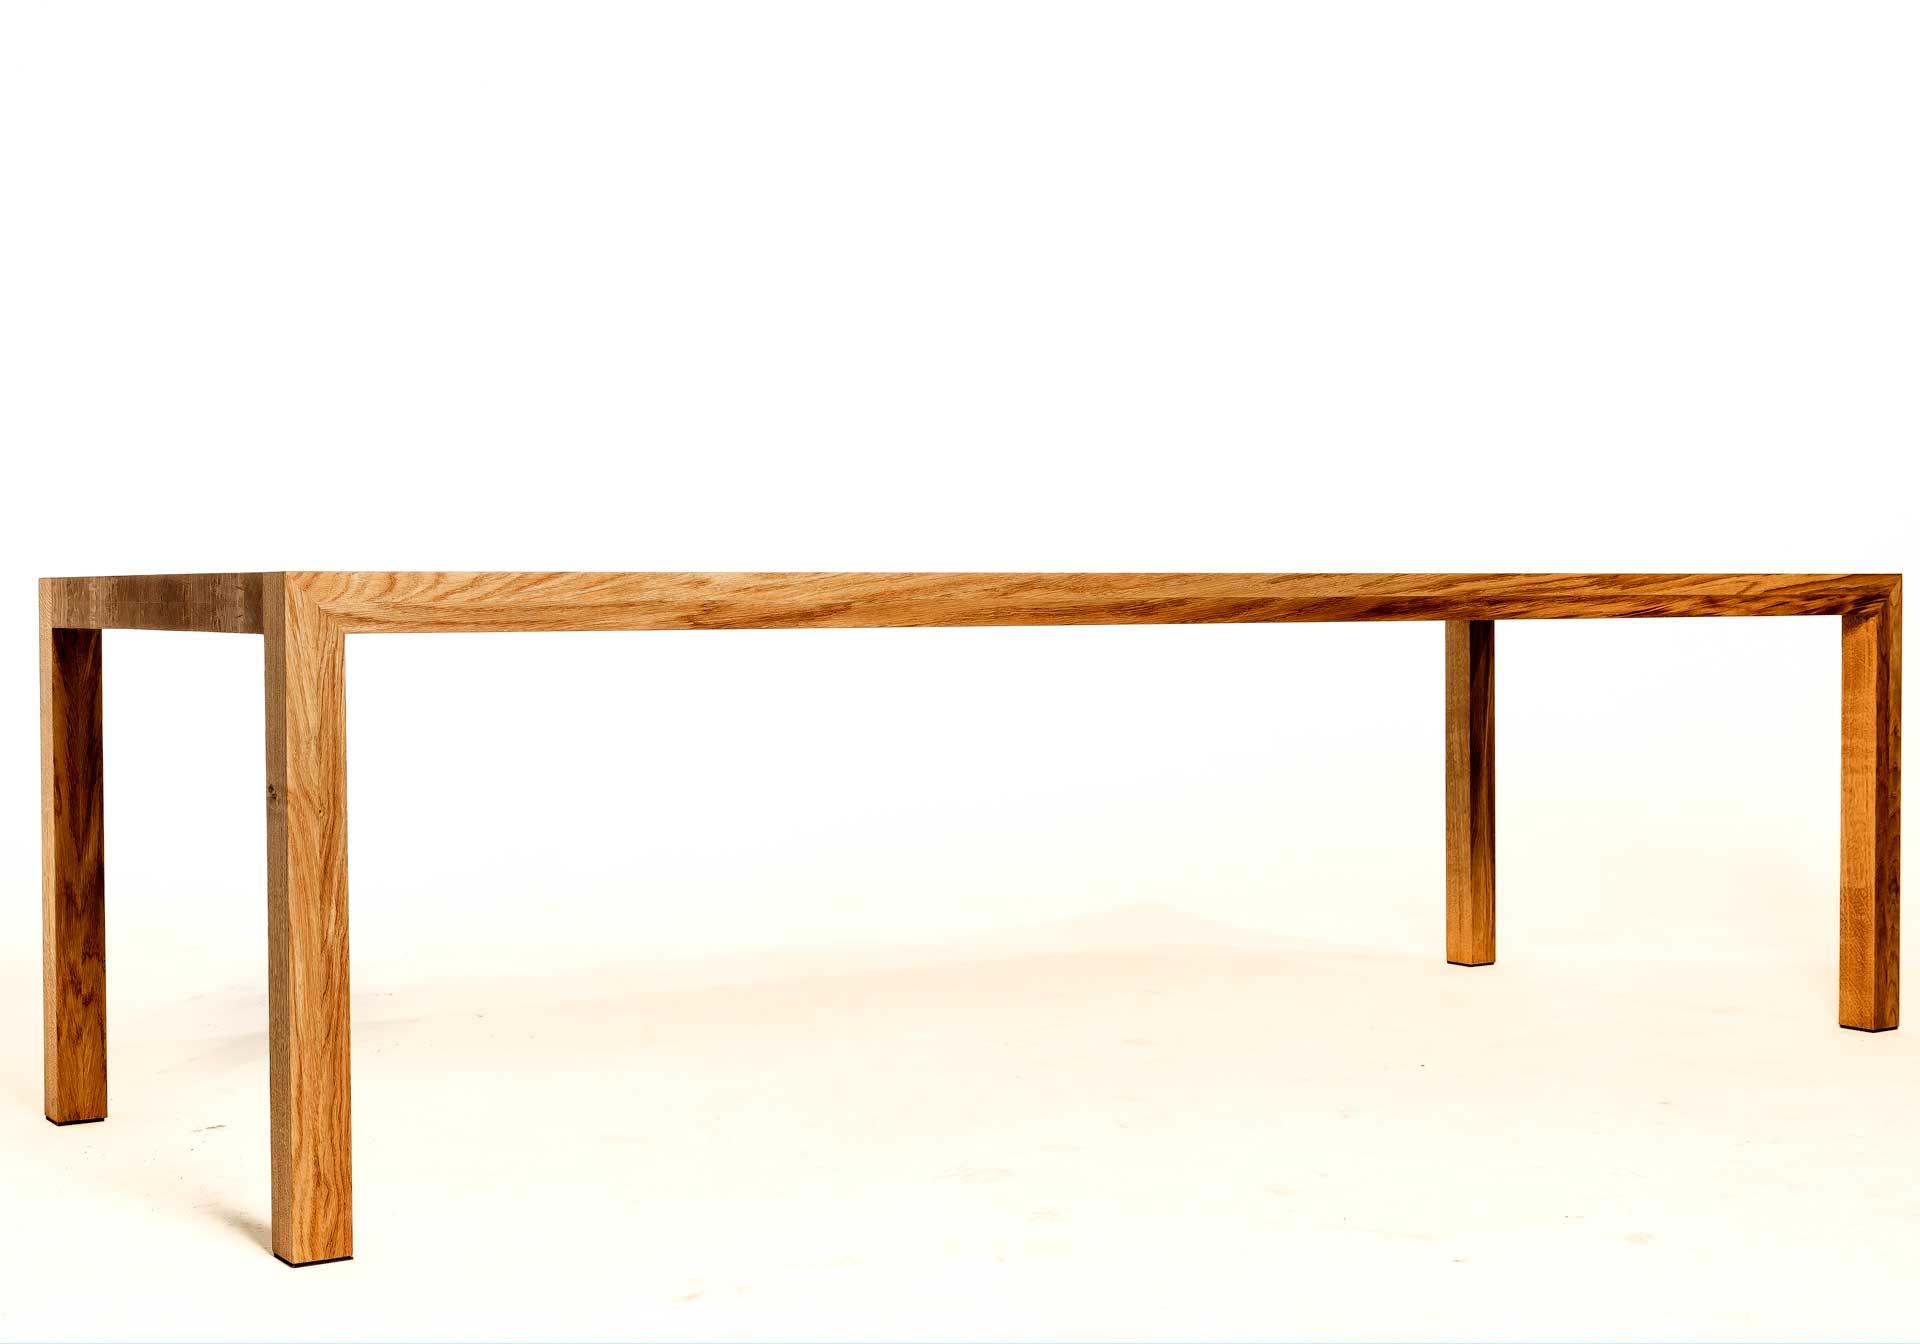 Slanke-en-lange-eiken-tafel